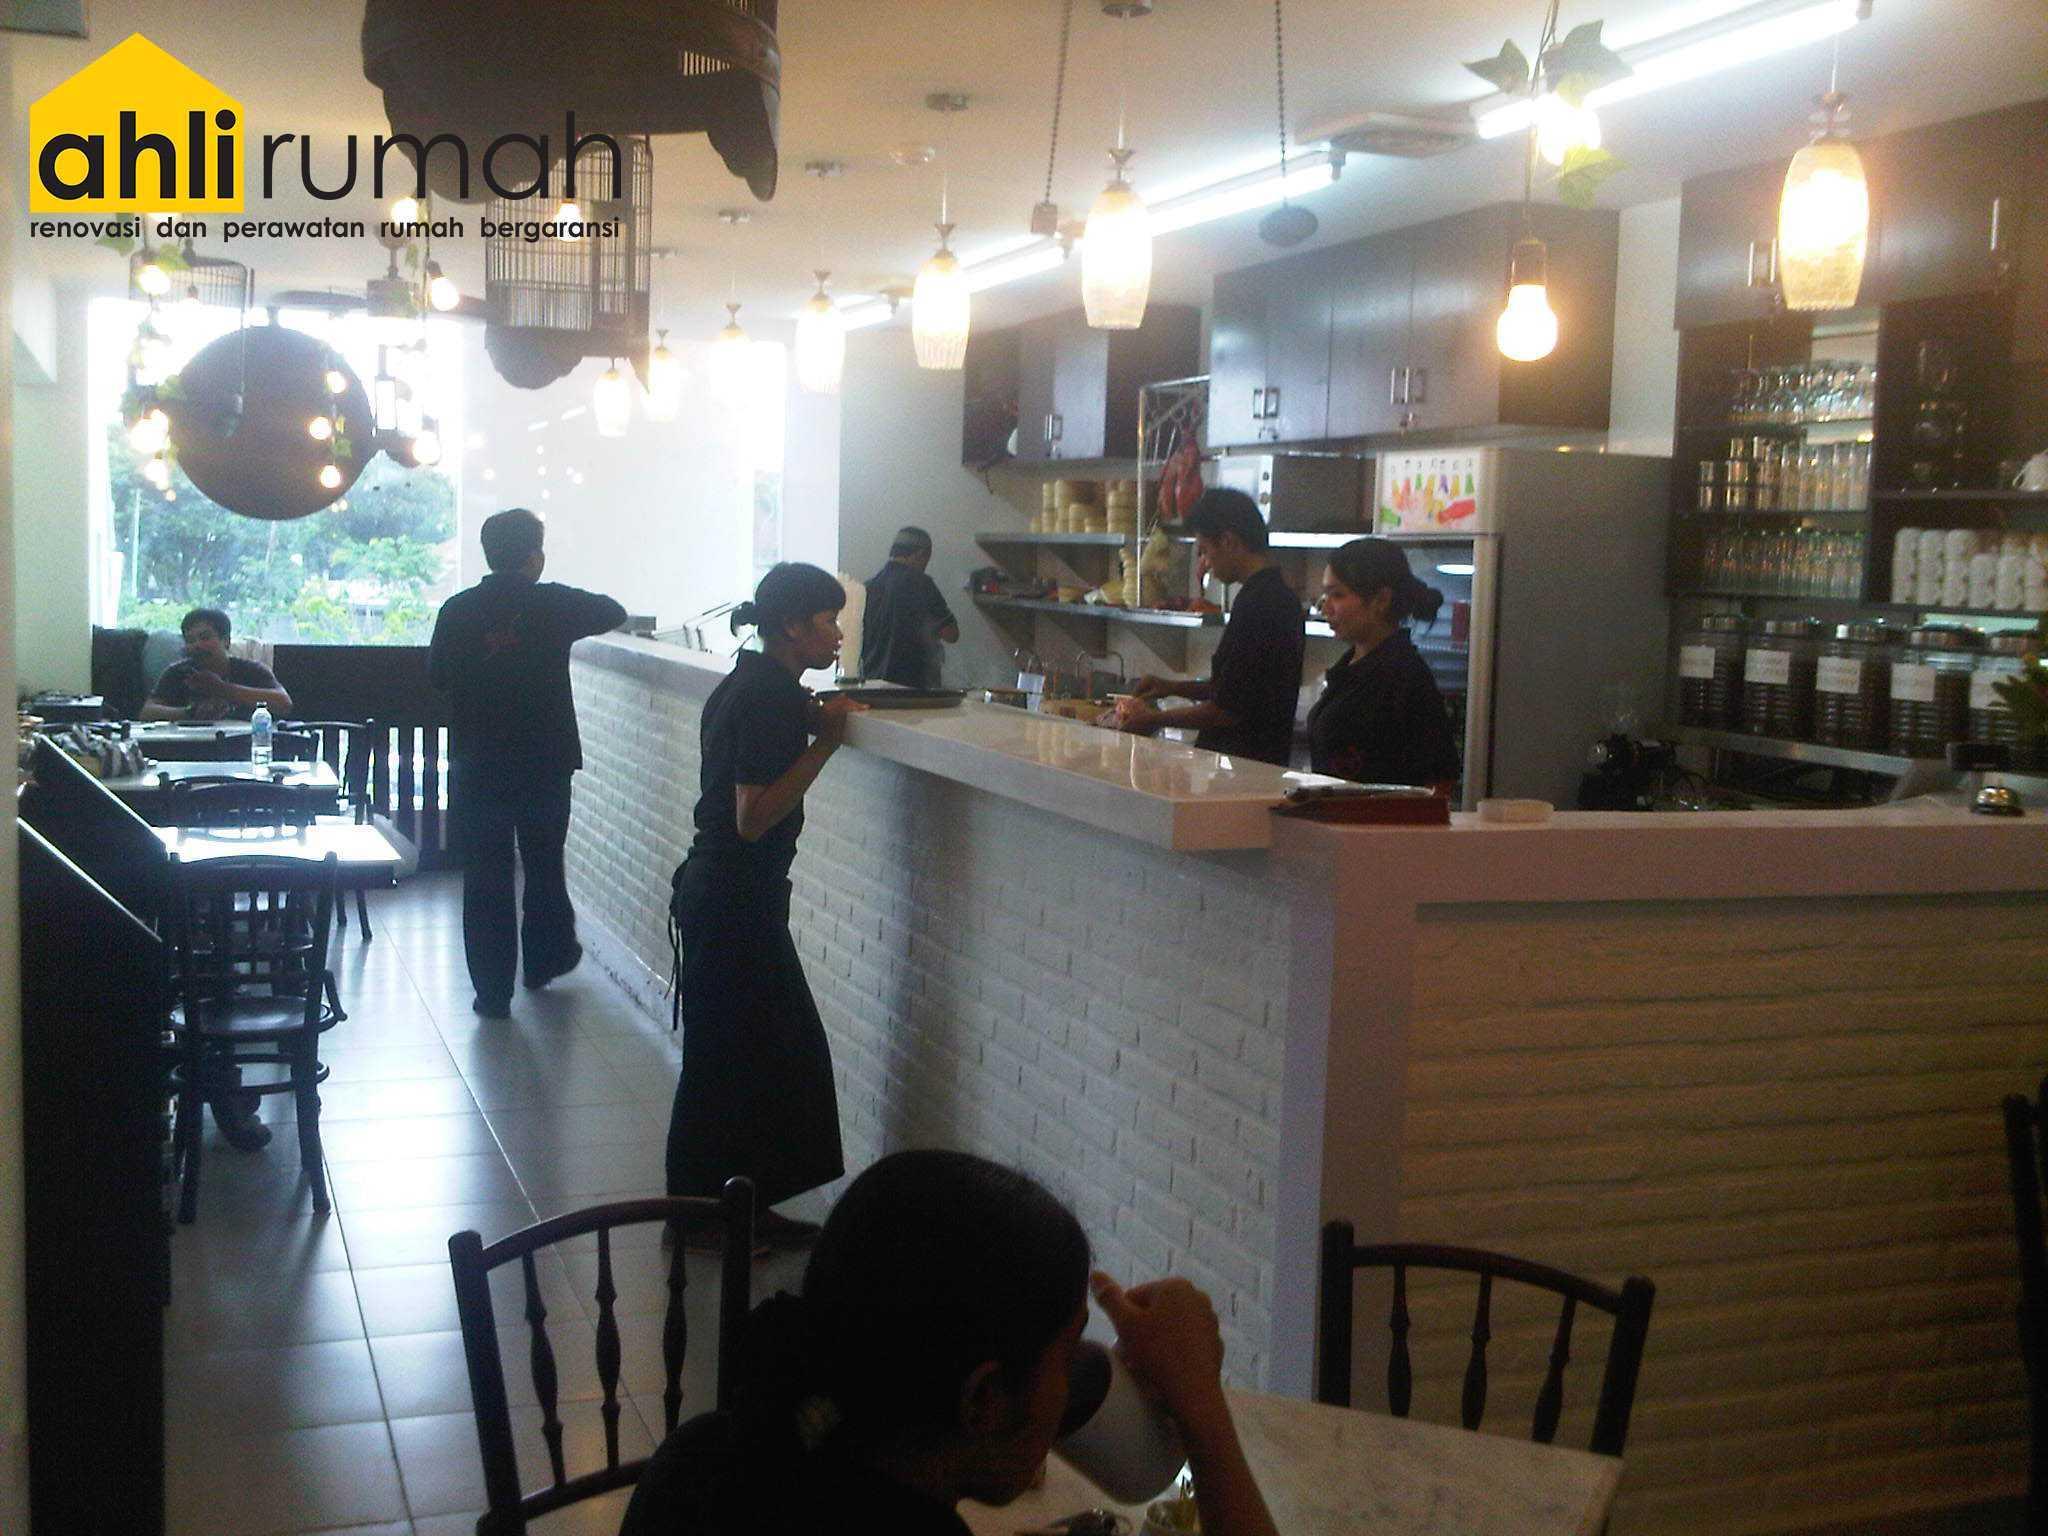 Ahlirumah.id Interior - Cafe Benoa   Ahlirumahid-Interior-Cafe-Benoa   49245